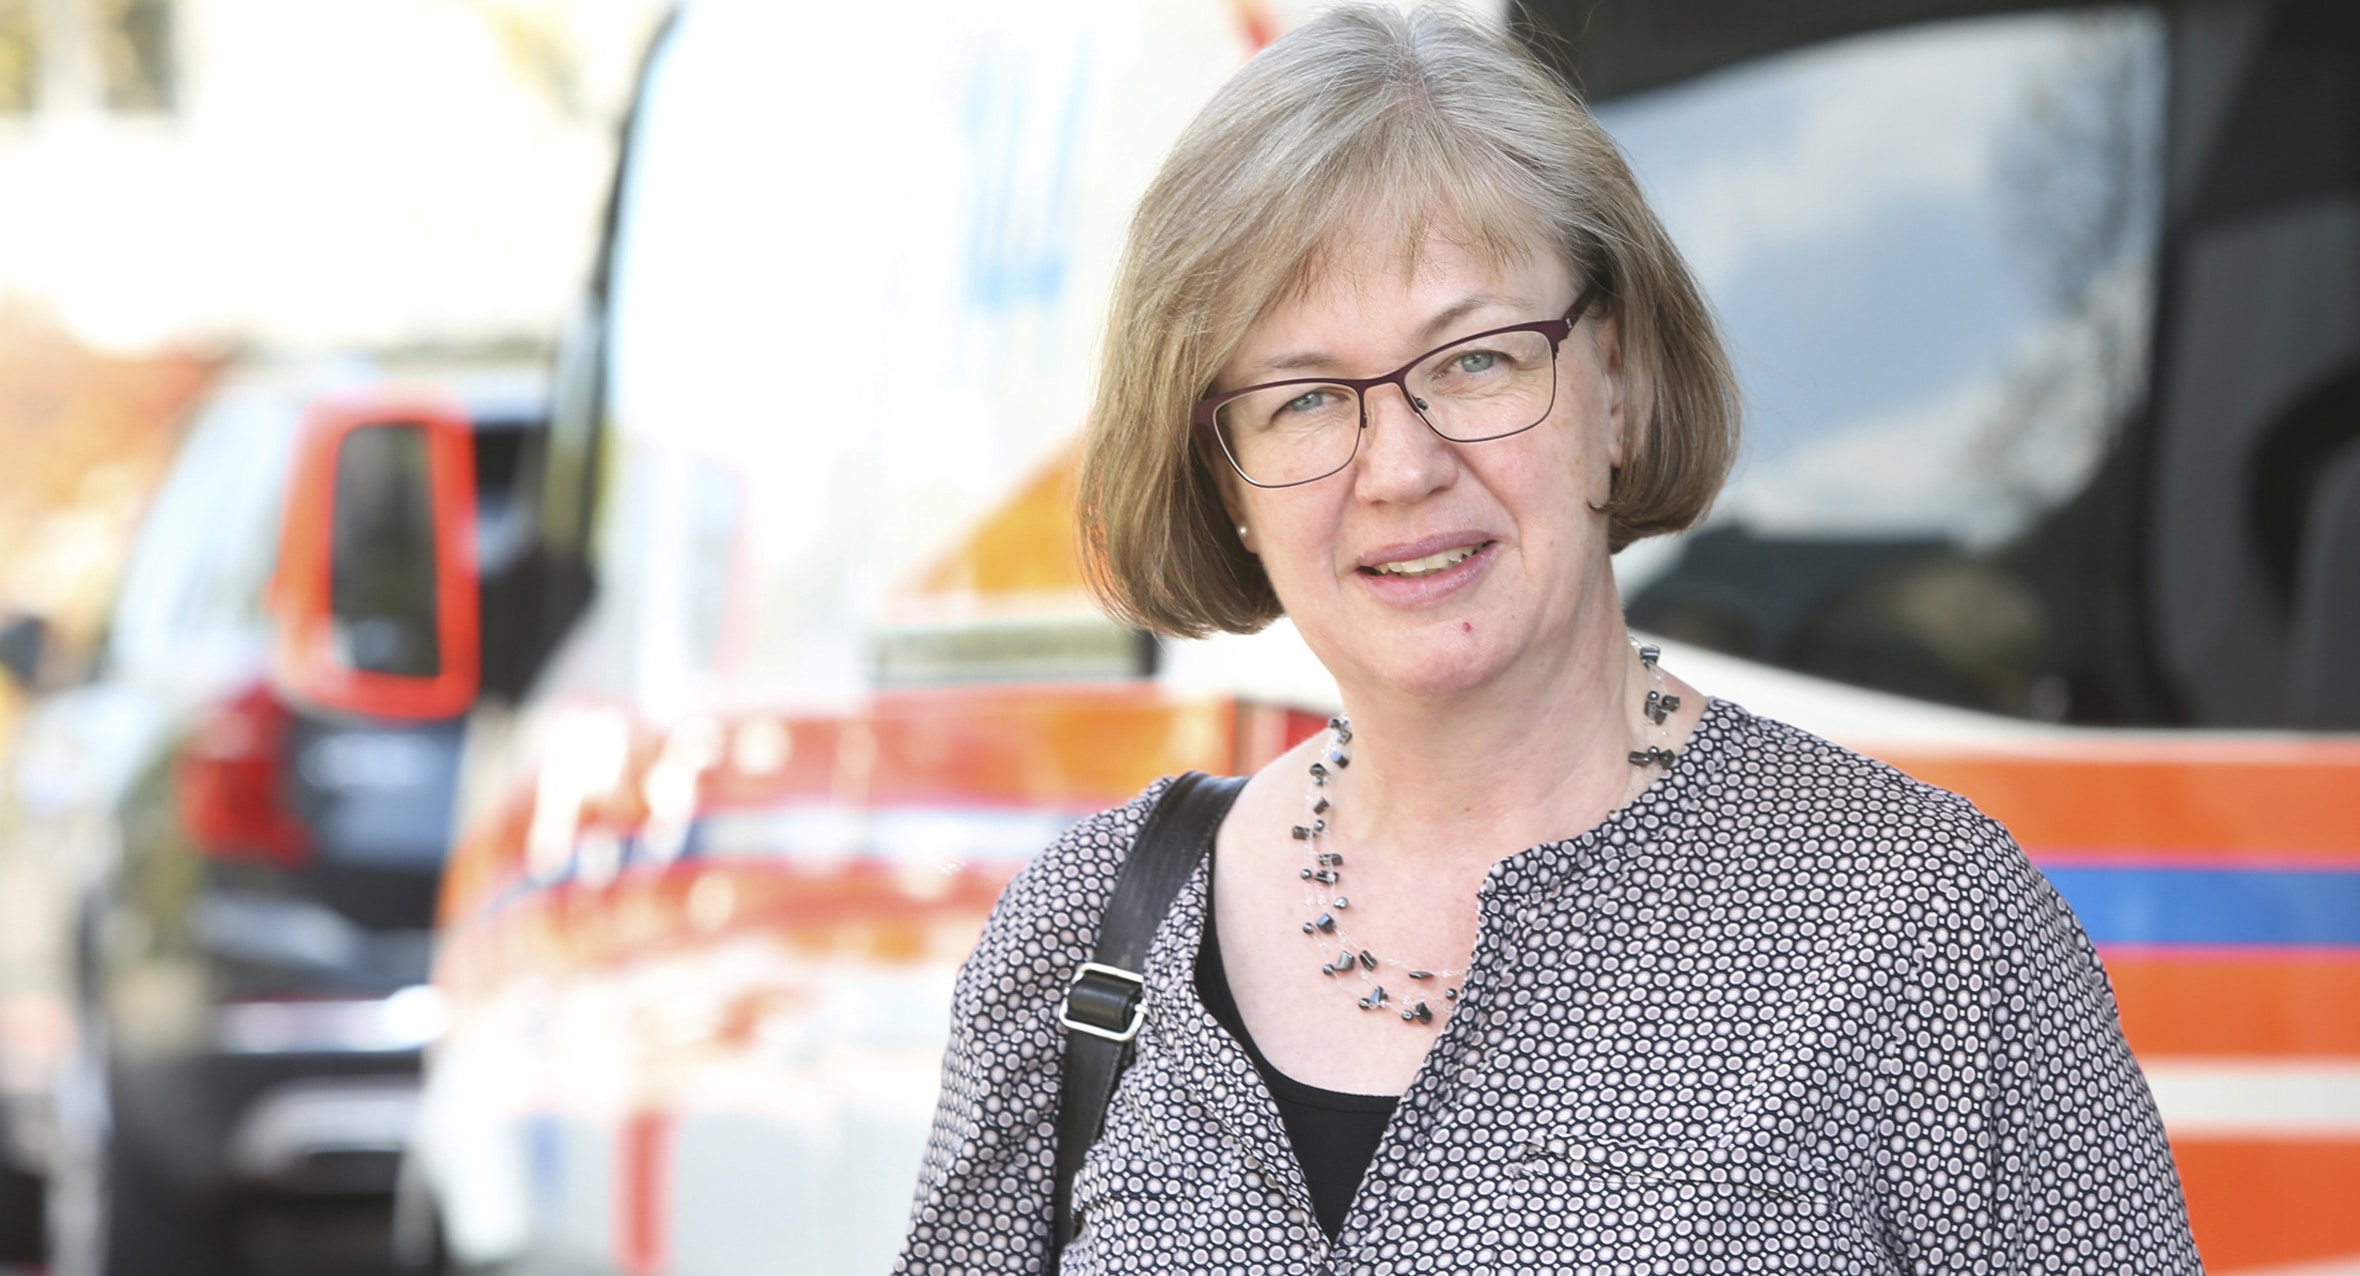 Simone Rüd, katholisch Theologin und Spitalseelsorgerin am Luzerner Kantonsspital LUKS